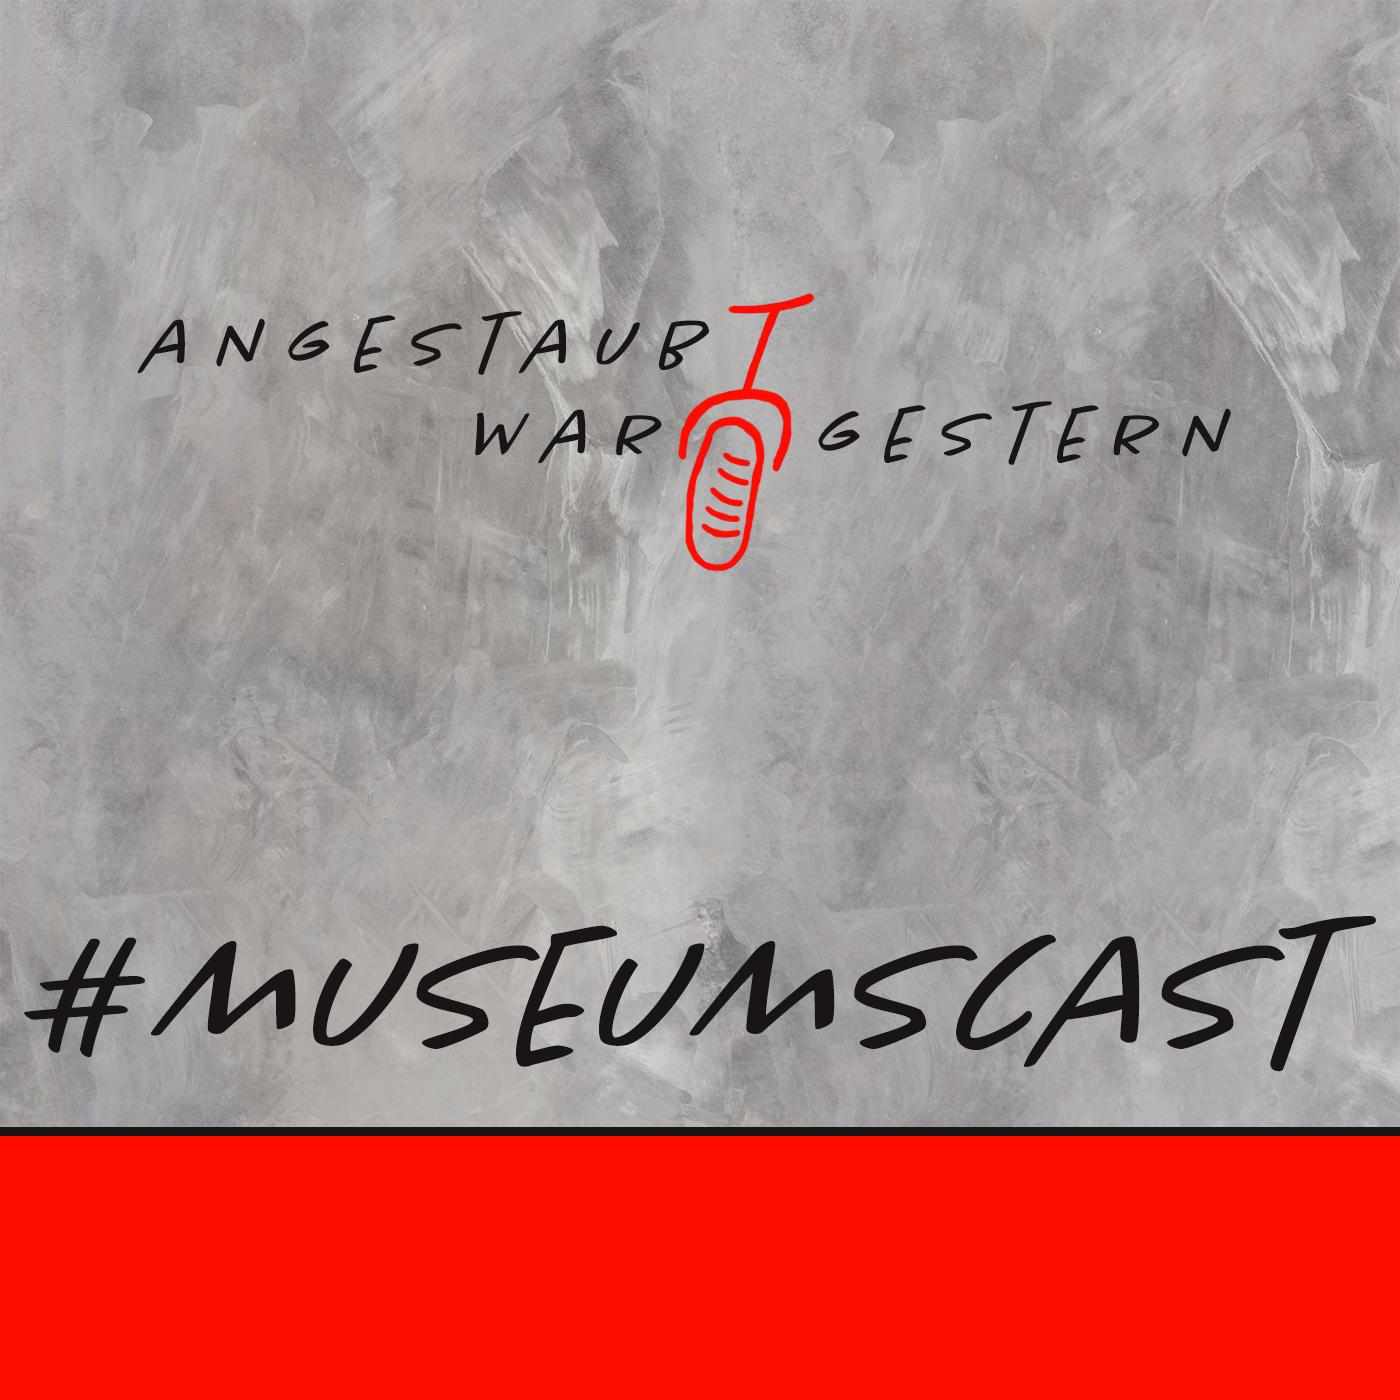 Museumscast - angestaubt war gestern